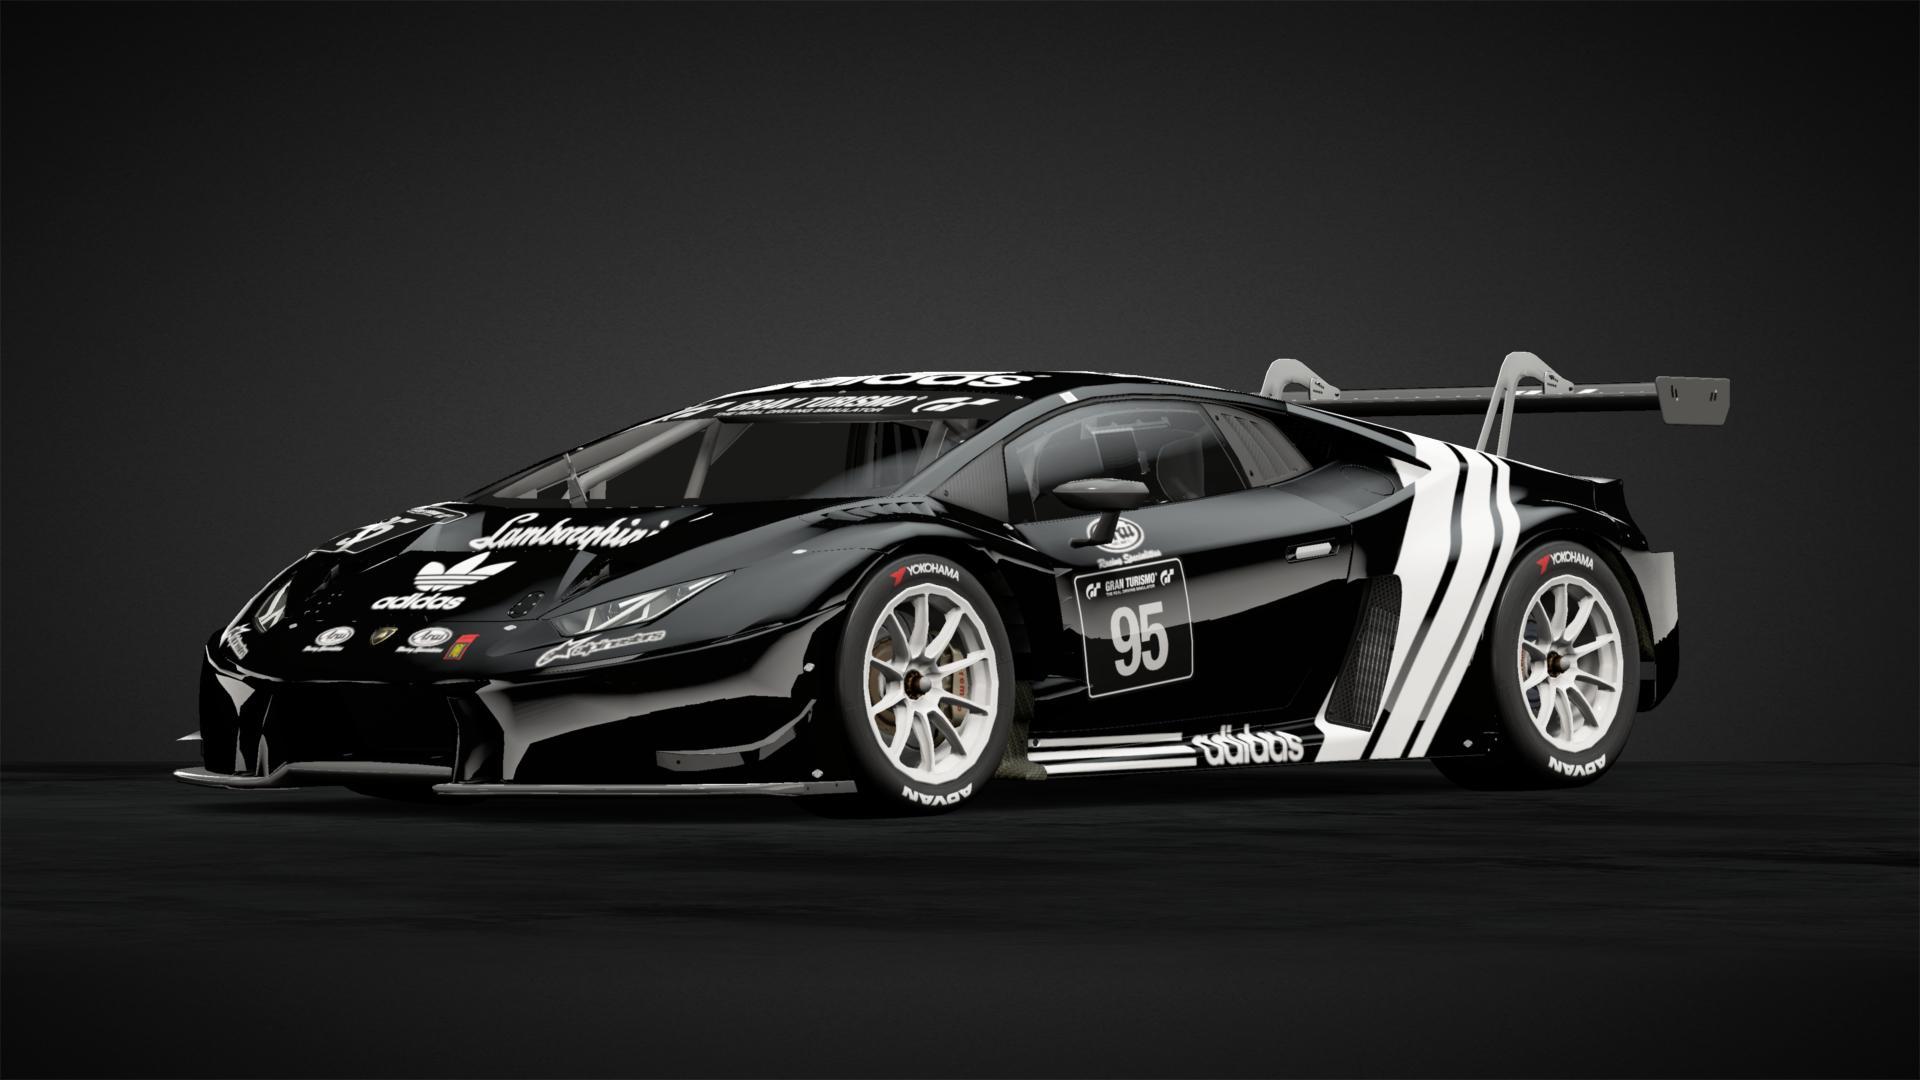 Lamborghini x Adidas Car Livery by ygrecs87 | Community